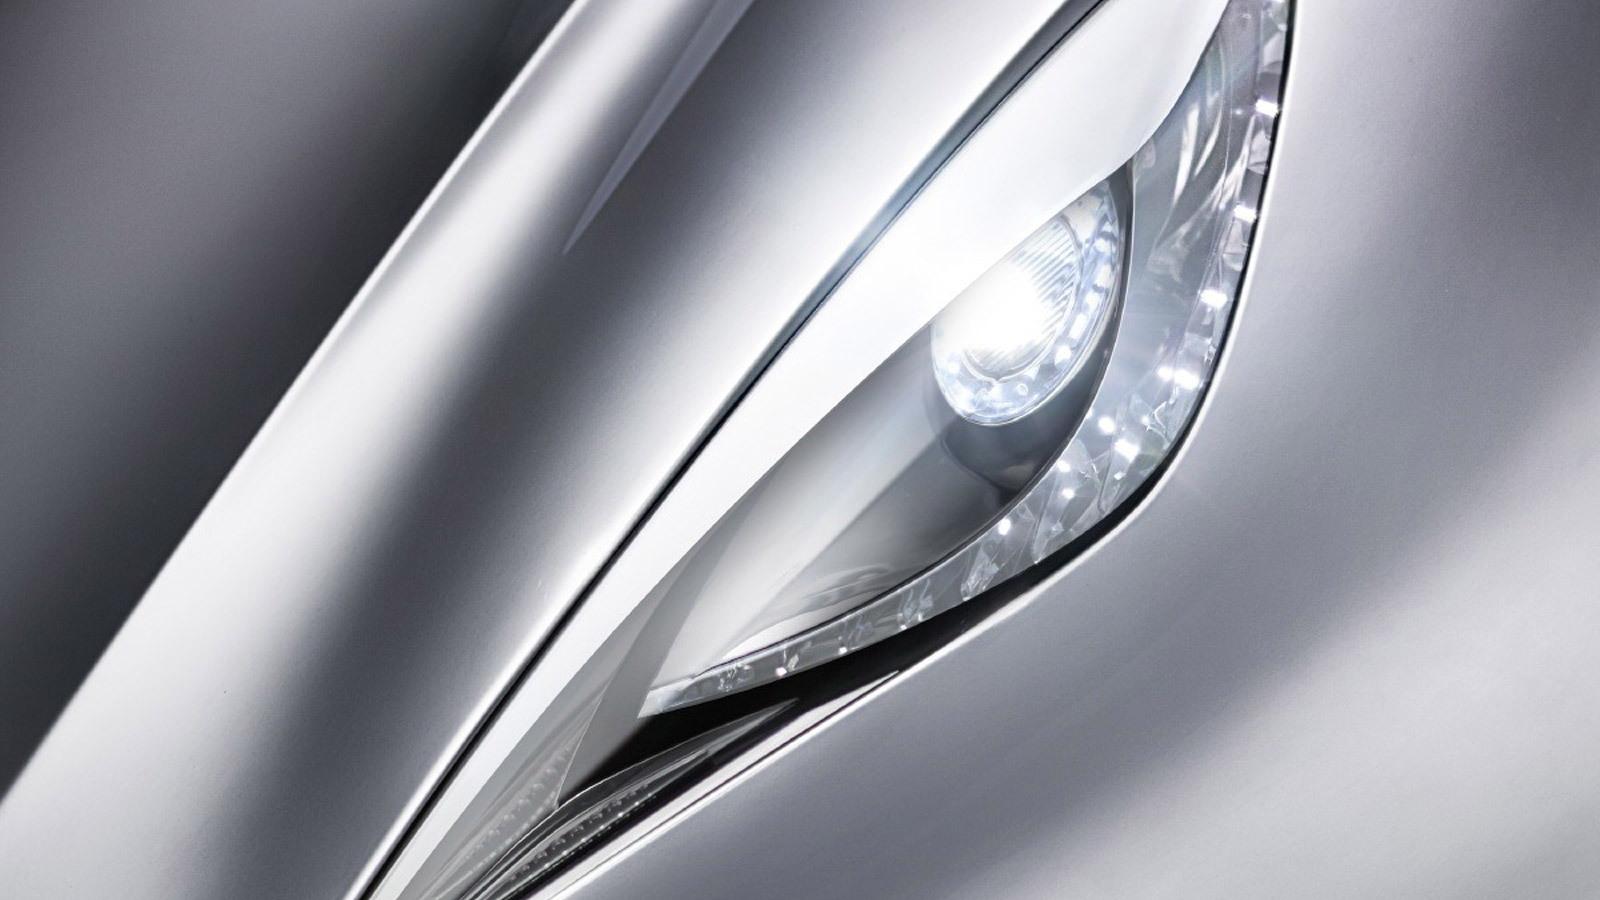 2012 Infiniti Emerg-E Concept leaked